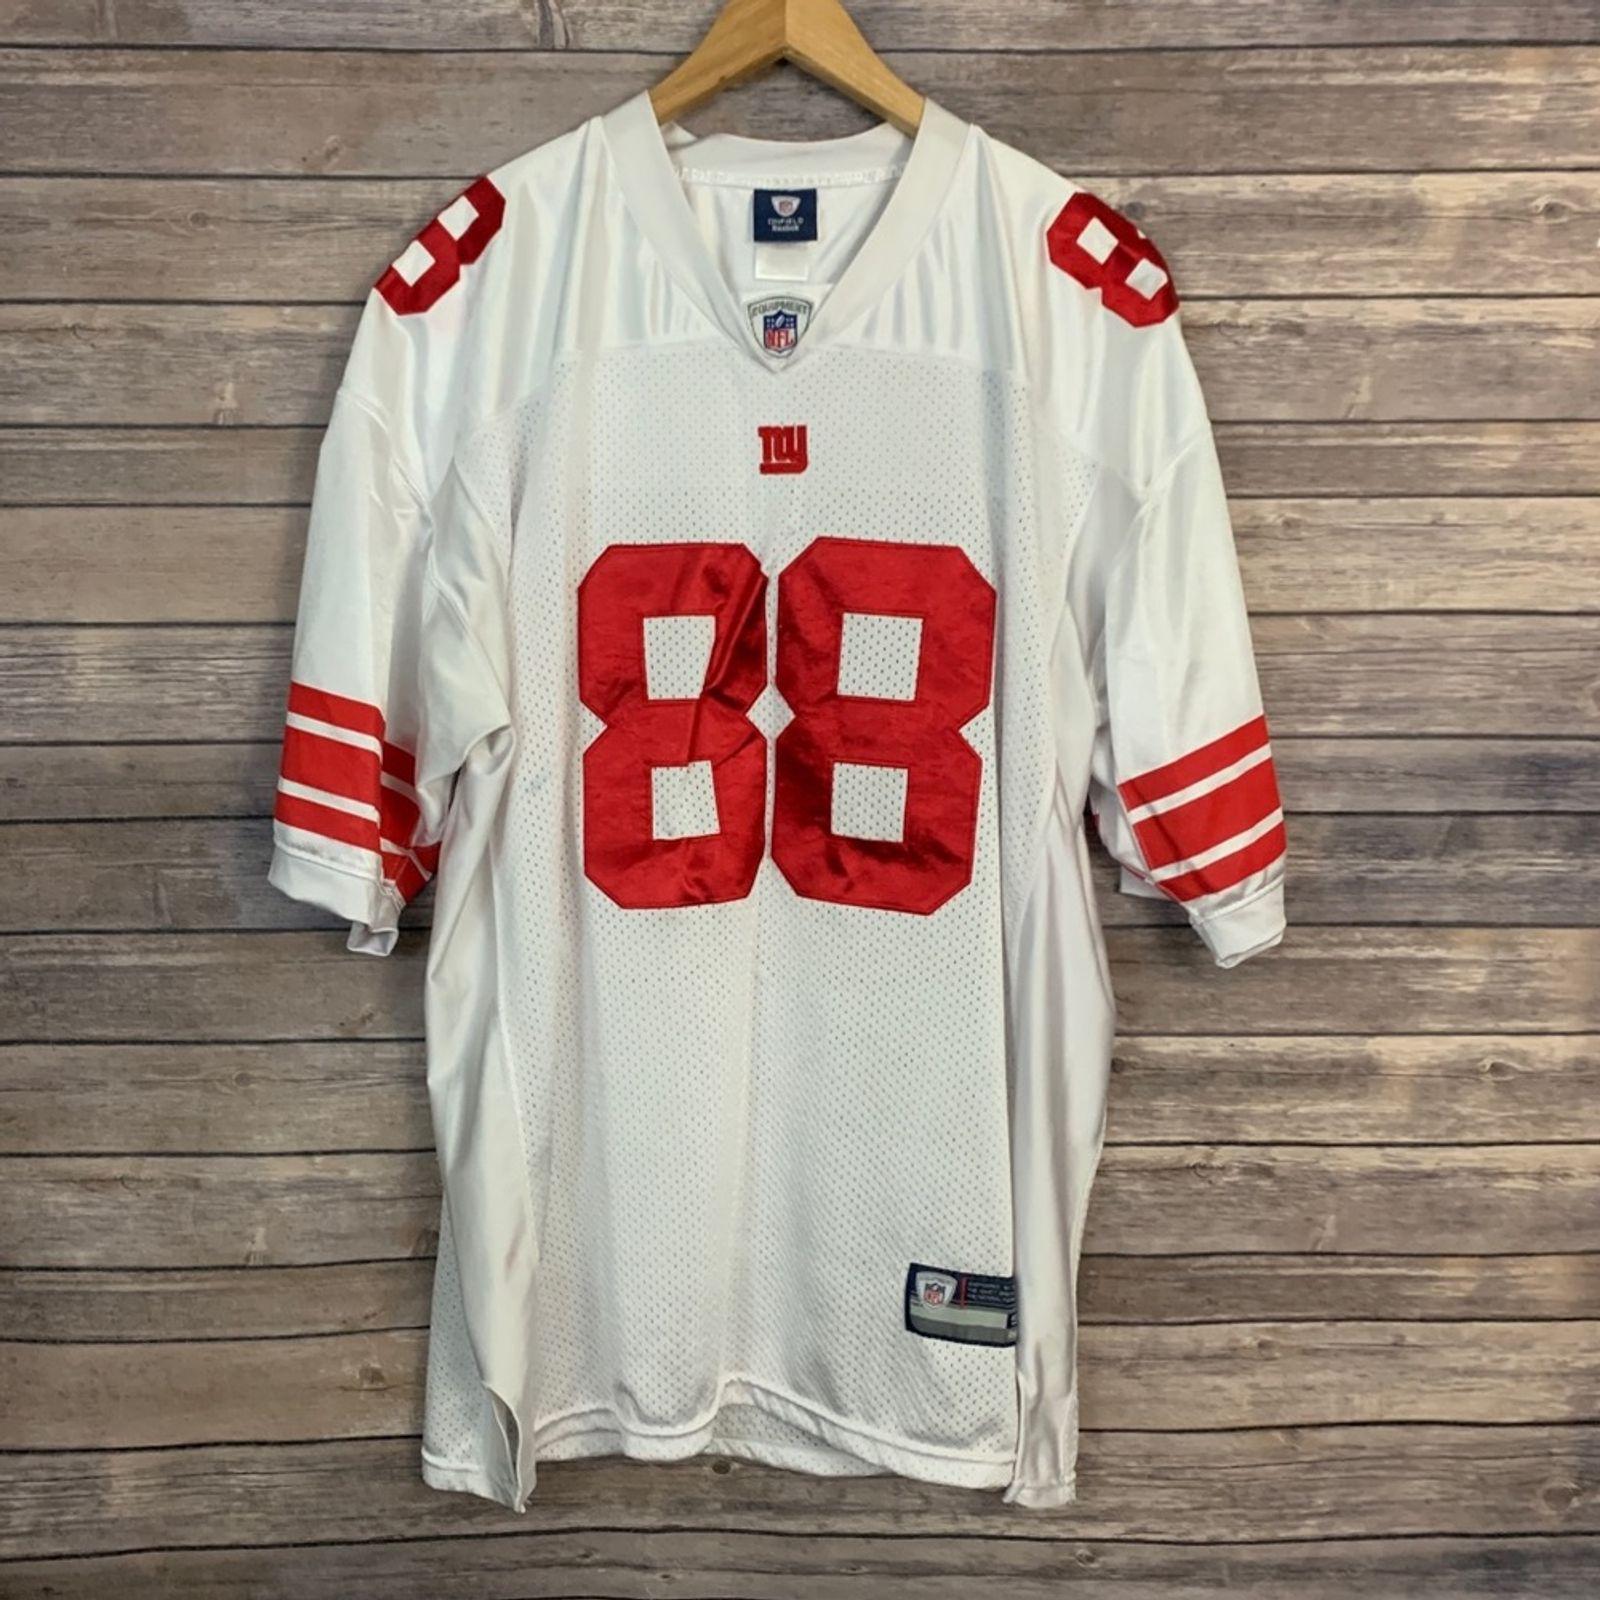 NFL New York Giants #88 Hakeem Nicks Jersey